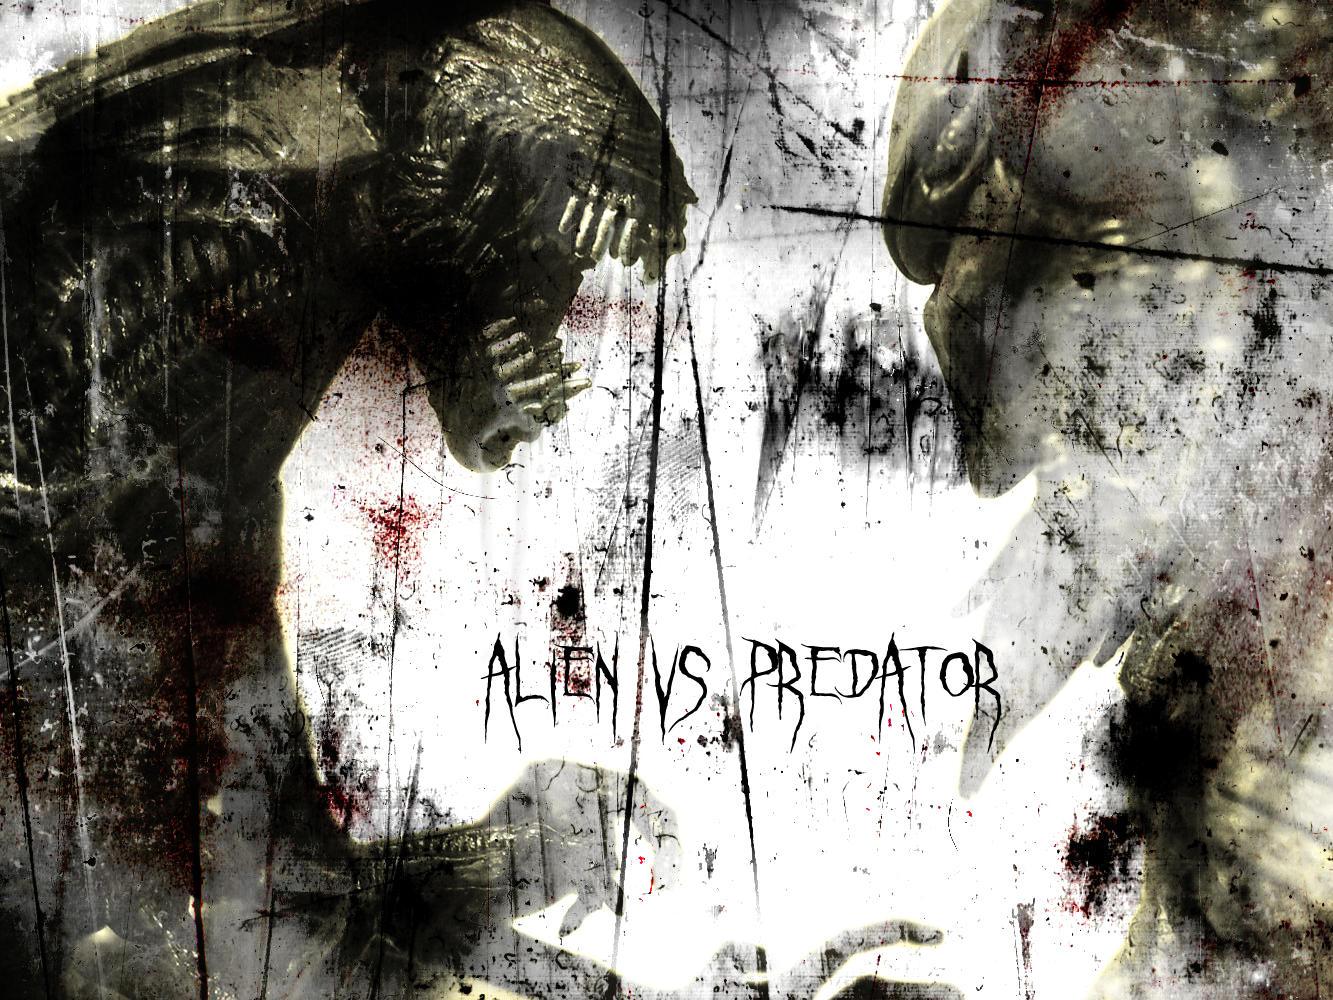 Alien Vs Predator by Autopsyrotica-Art